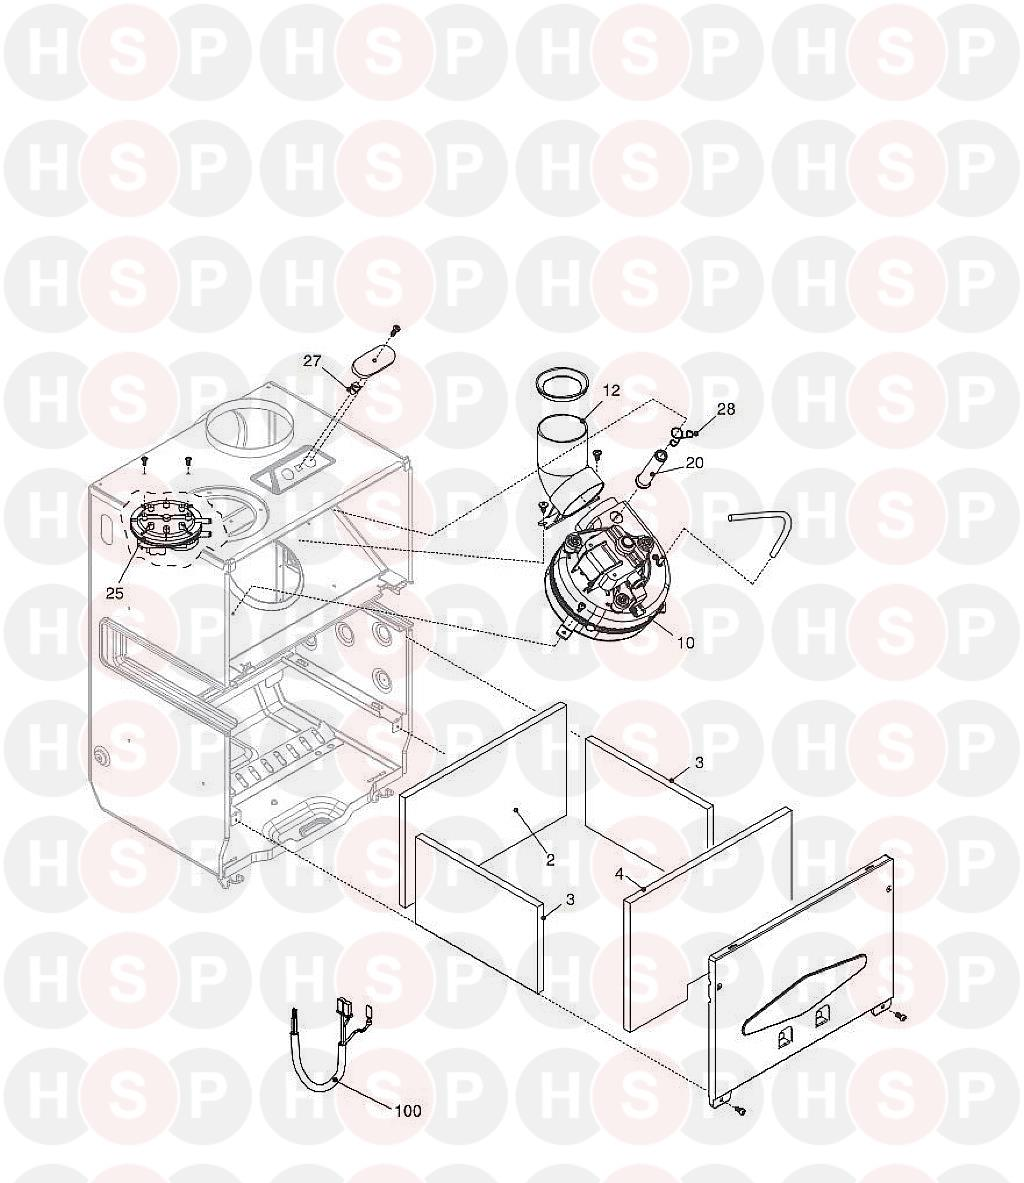 vokera compact 28 fan diagram heating spare parts. Black Bedroom Furniture Sets. Home Design Ideas